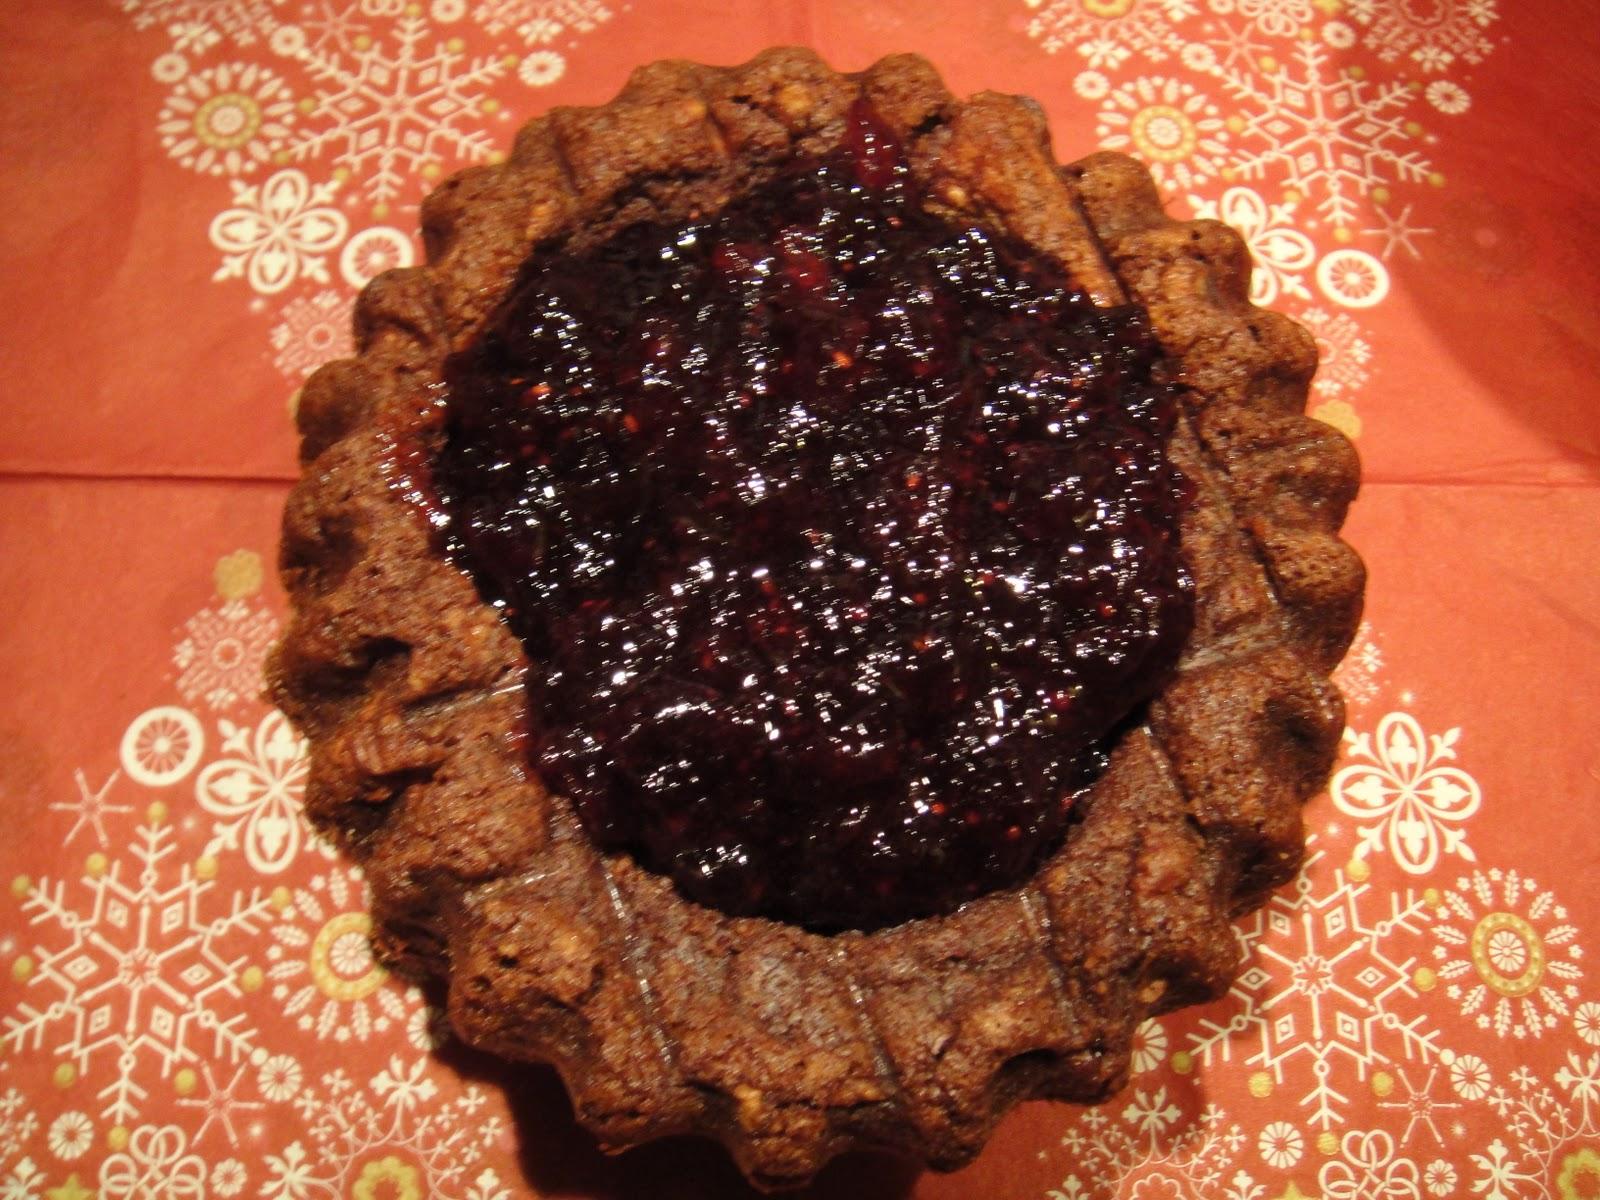 Hugh Fearnley Whittingstall Chocolate Chestnut Cake